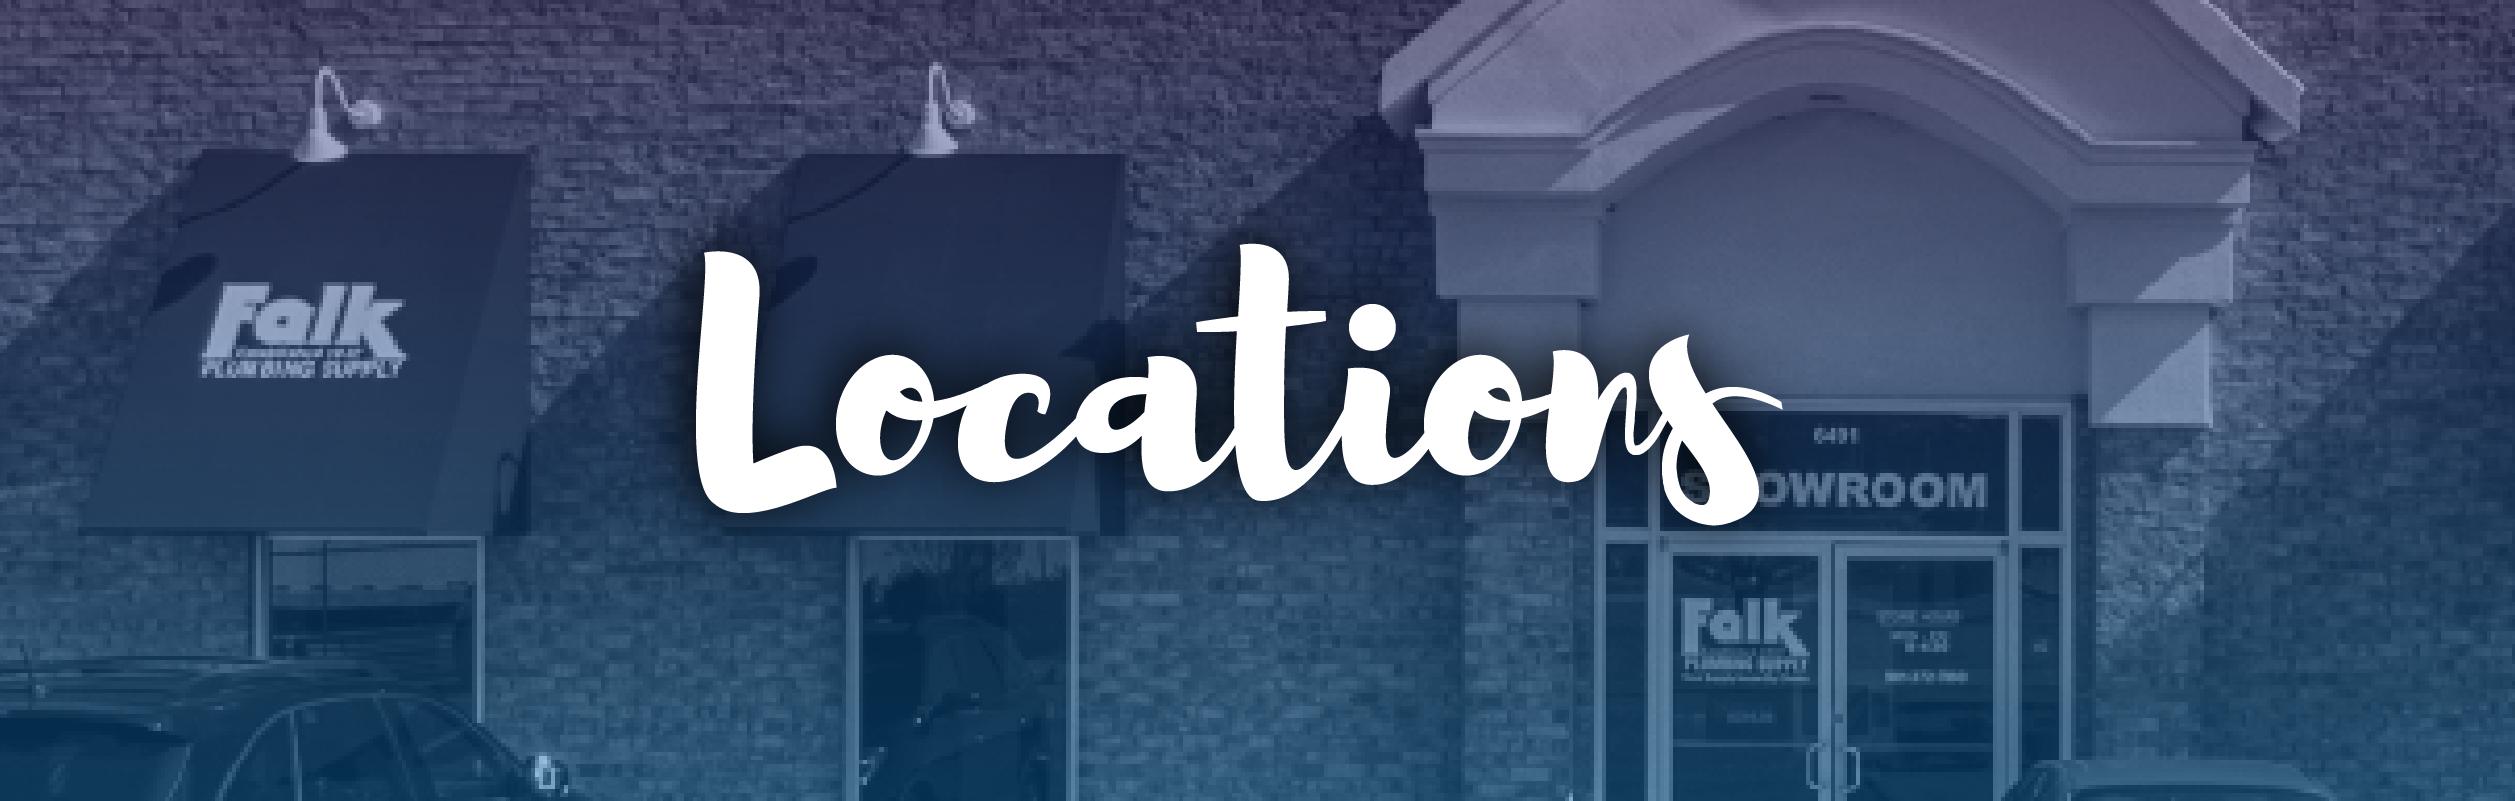 Locations-01